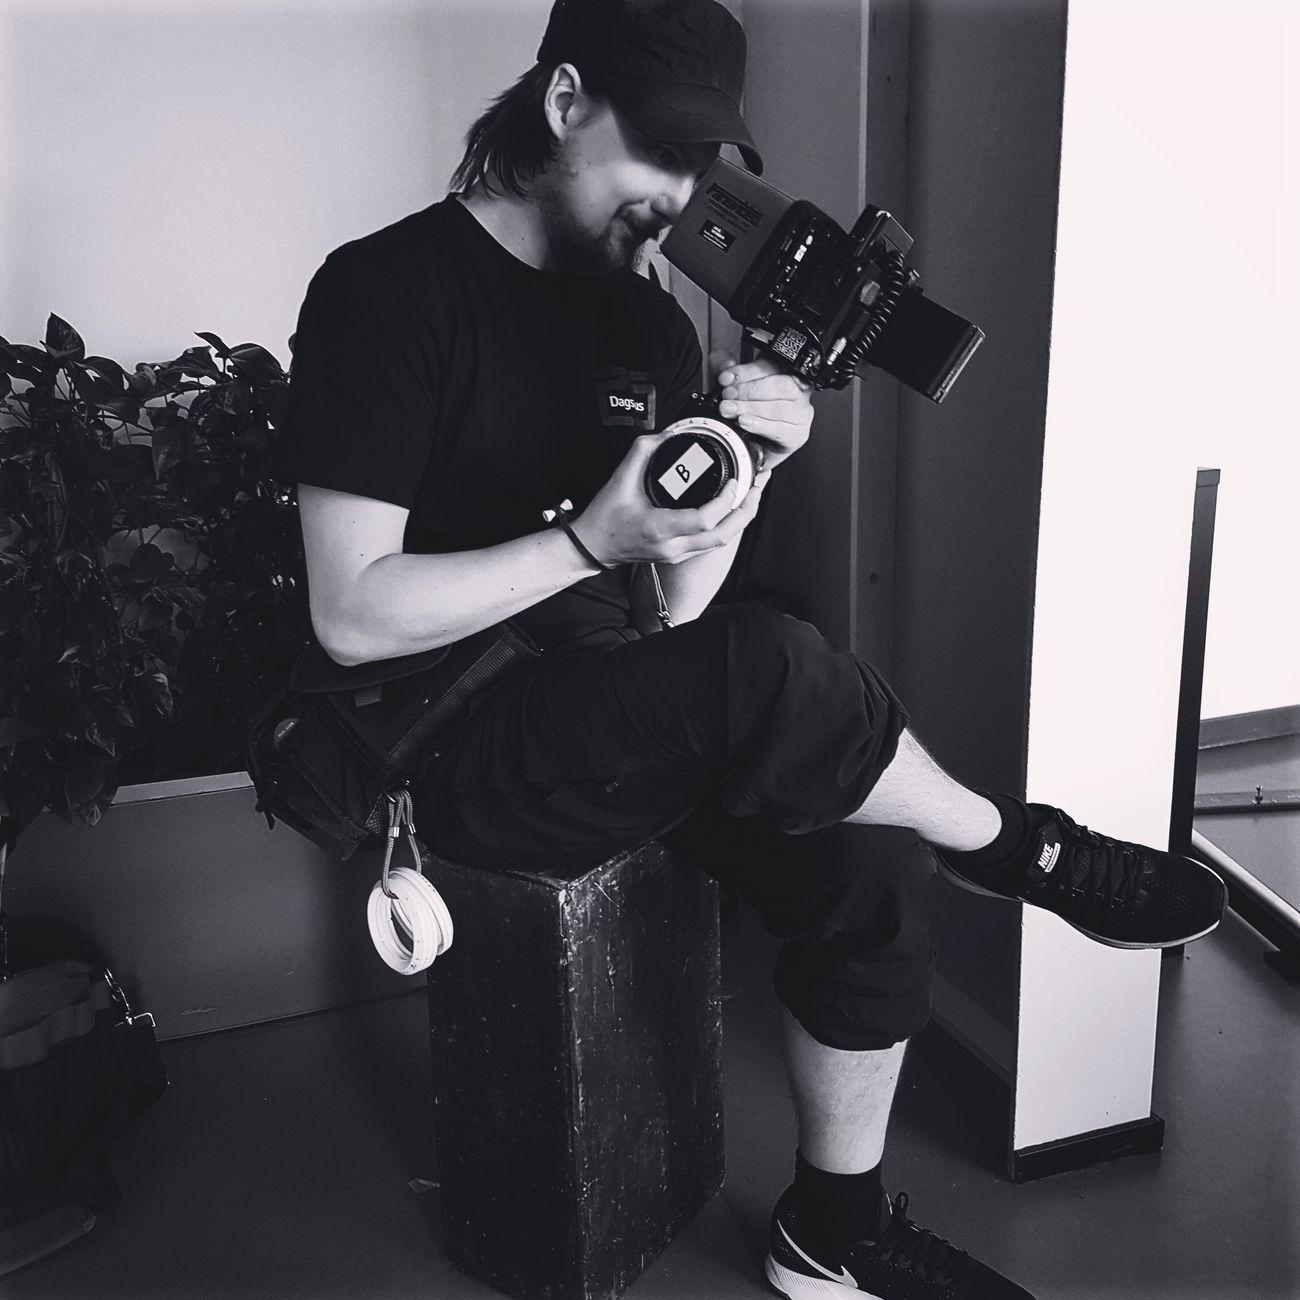 Me focus pulling a tv series😊 K35 Lense Wcu 3 Boxx Atom Boxx Arri Mini Tv-series 1-AC Love ARRI Focus Puller Film Location Setlife ARRI Life On Set Filmset I Love My Job! Sweden Film Arri Belt